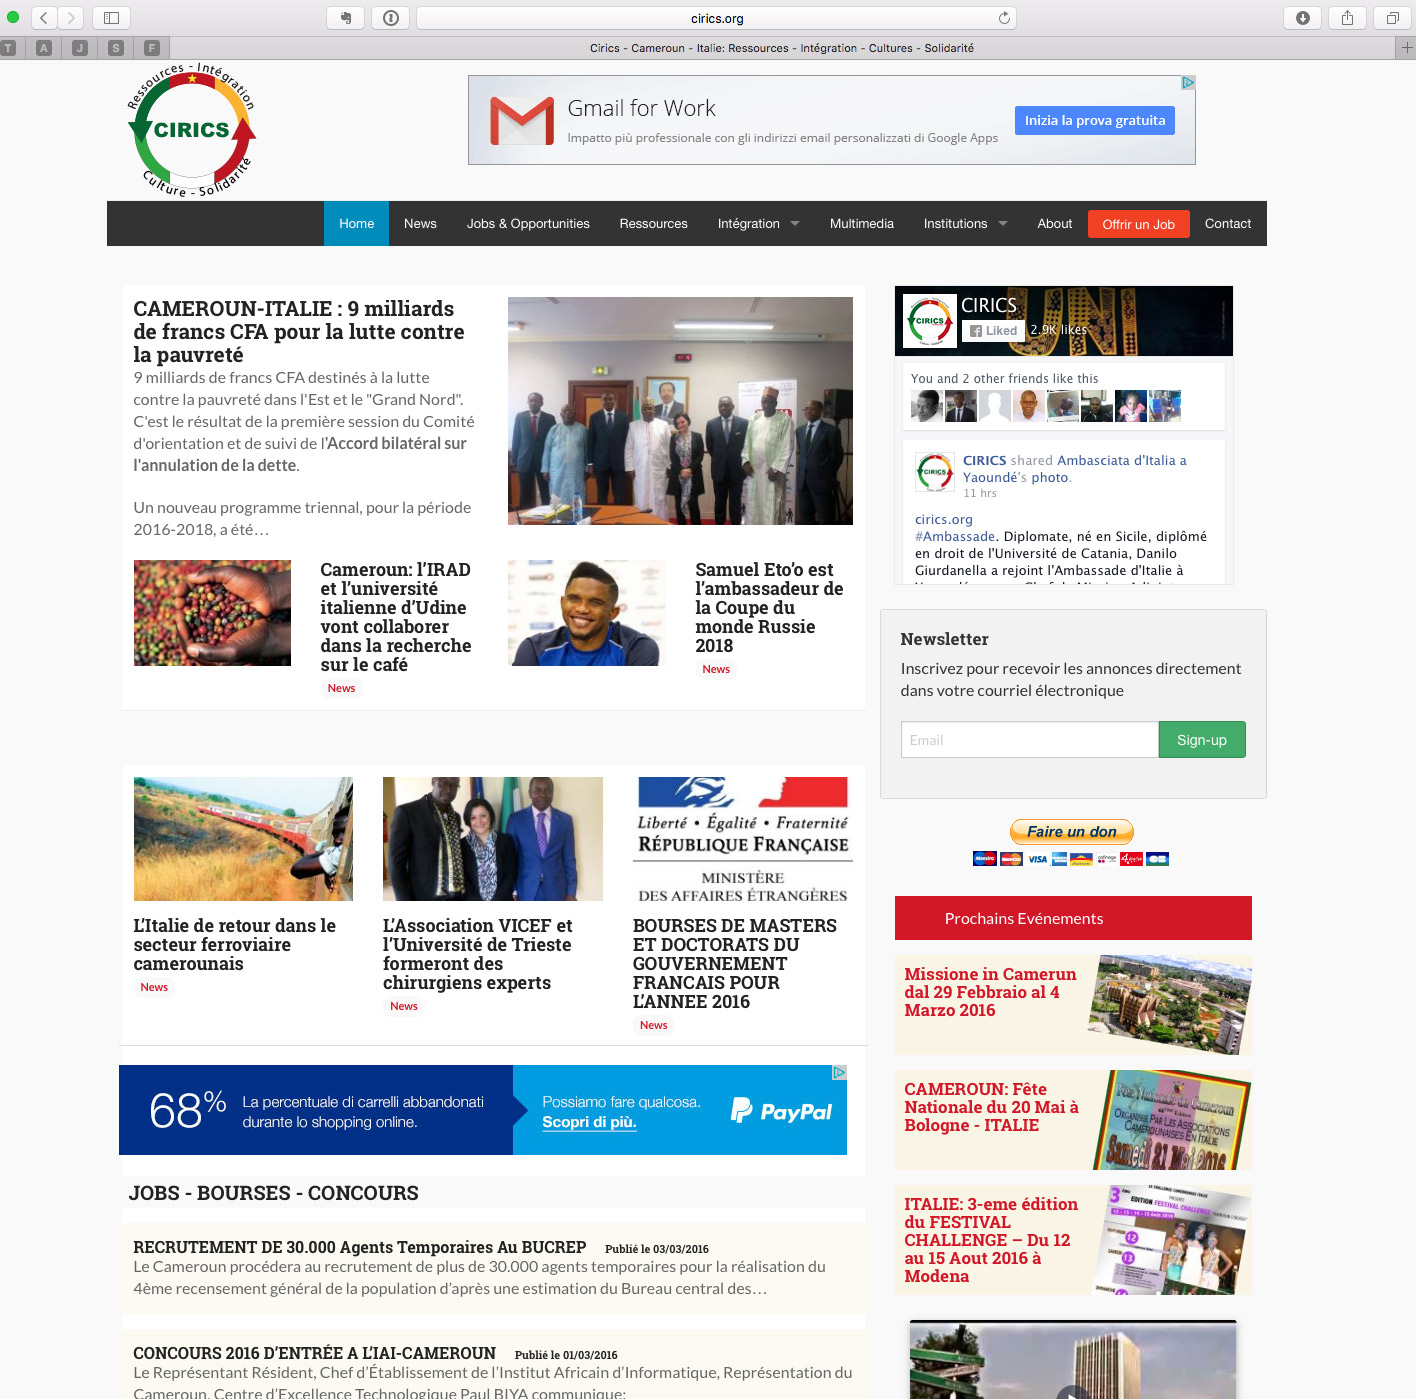 Cirics - Camerun-Italia-Risorse-Integrazione-Cultura-Solidarietà